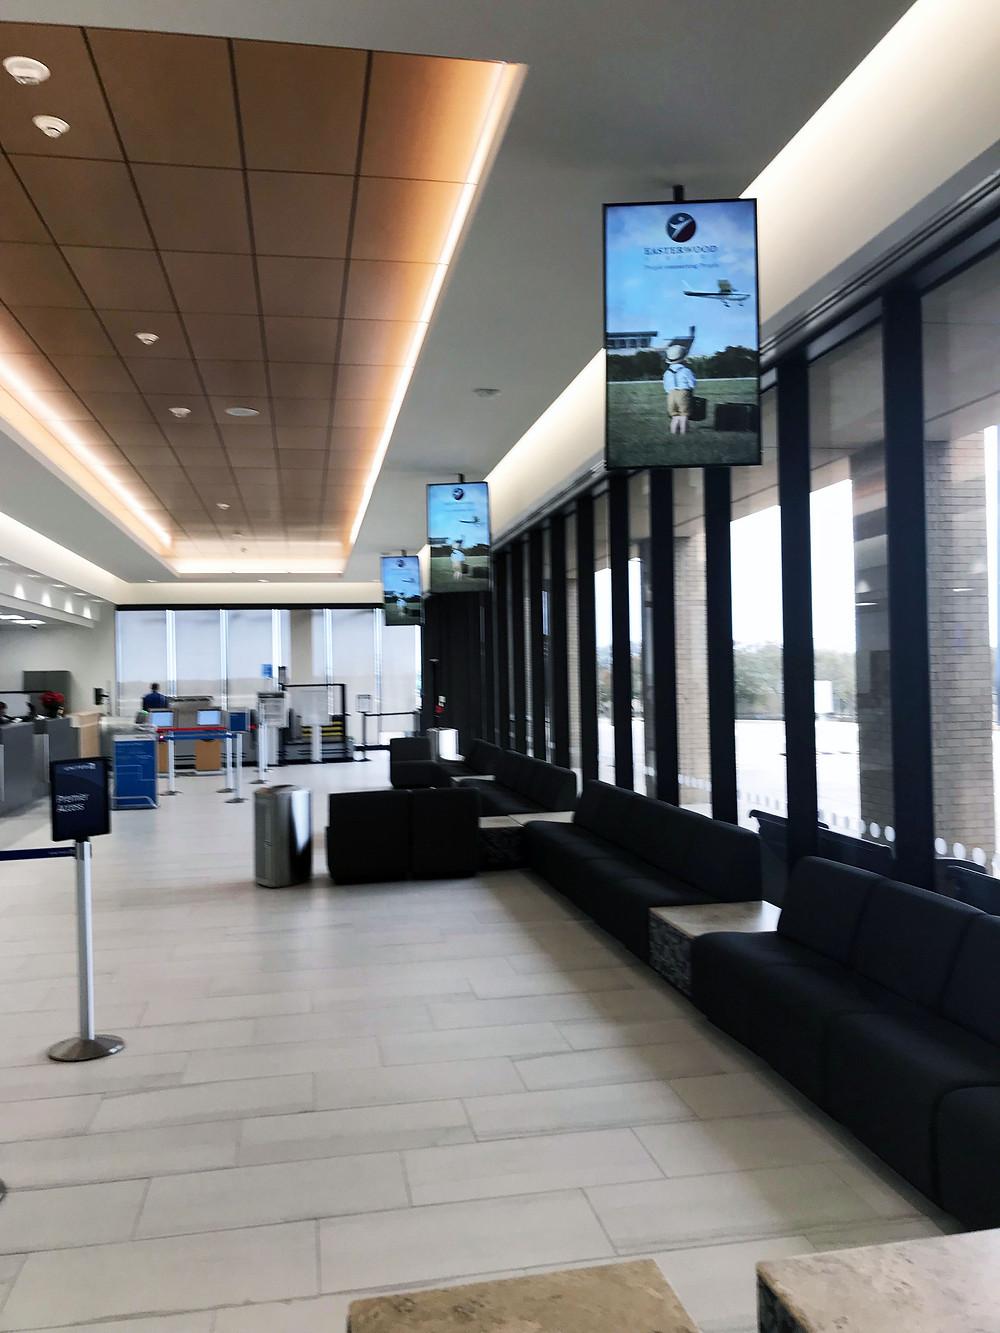 Easterwood Airport renovation